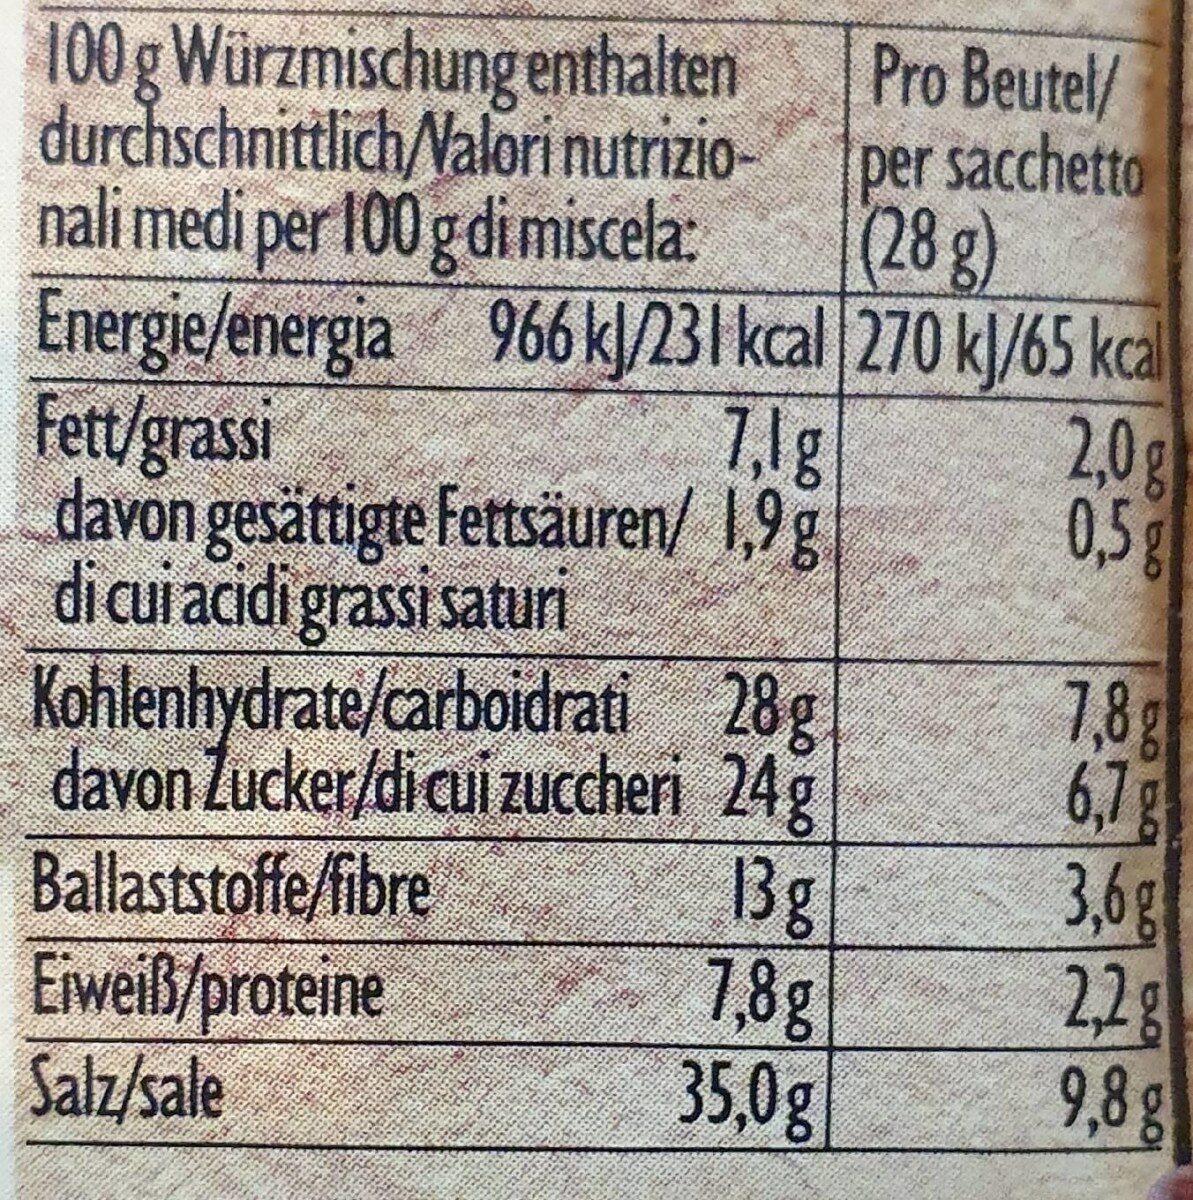 Épices pour viande burger - Voedingswaarden - fr